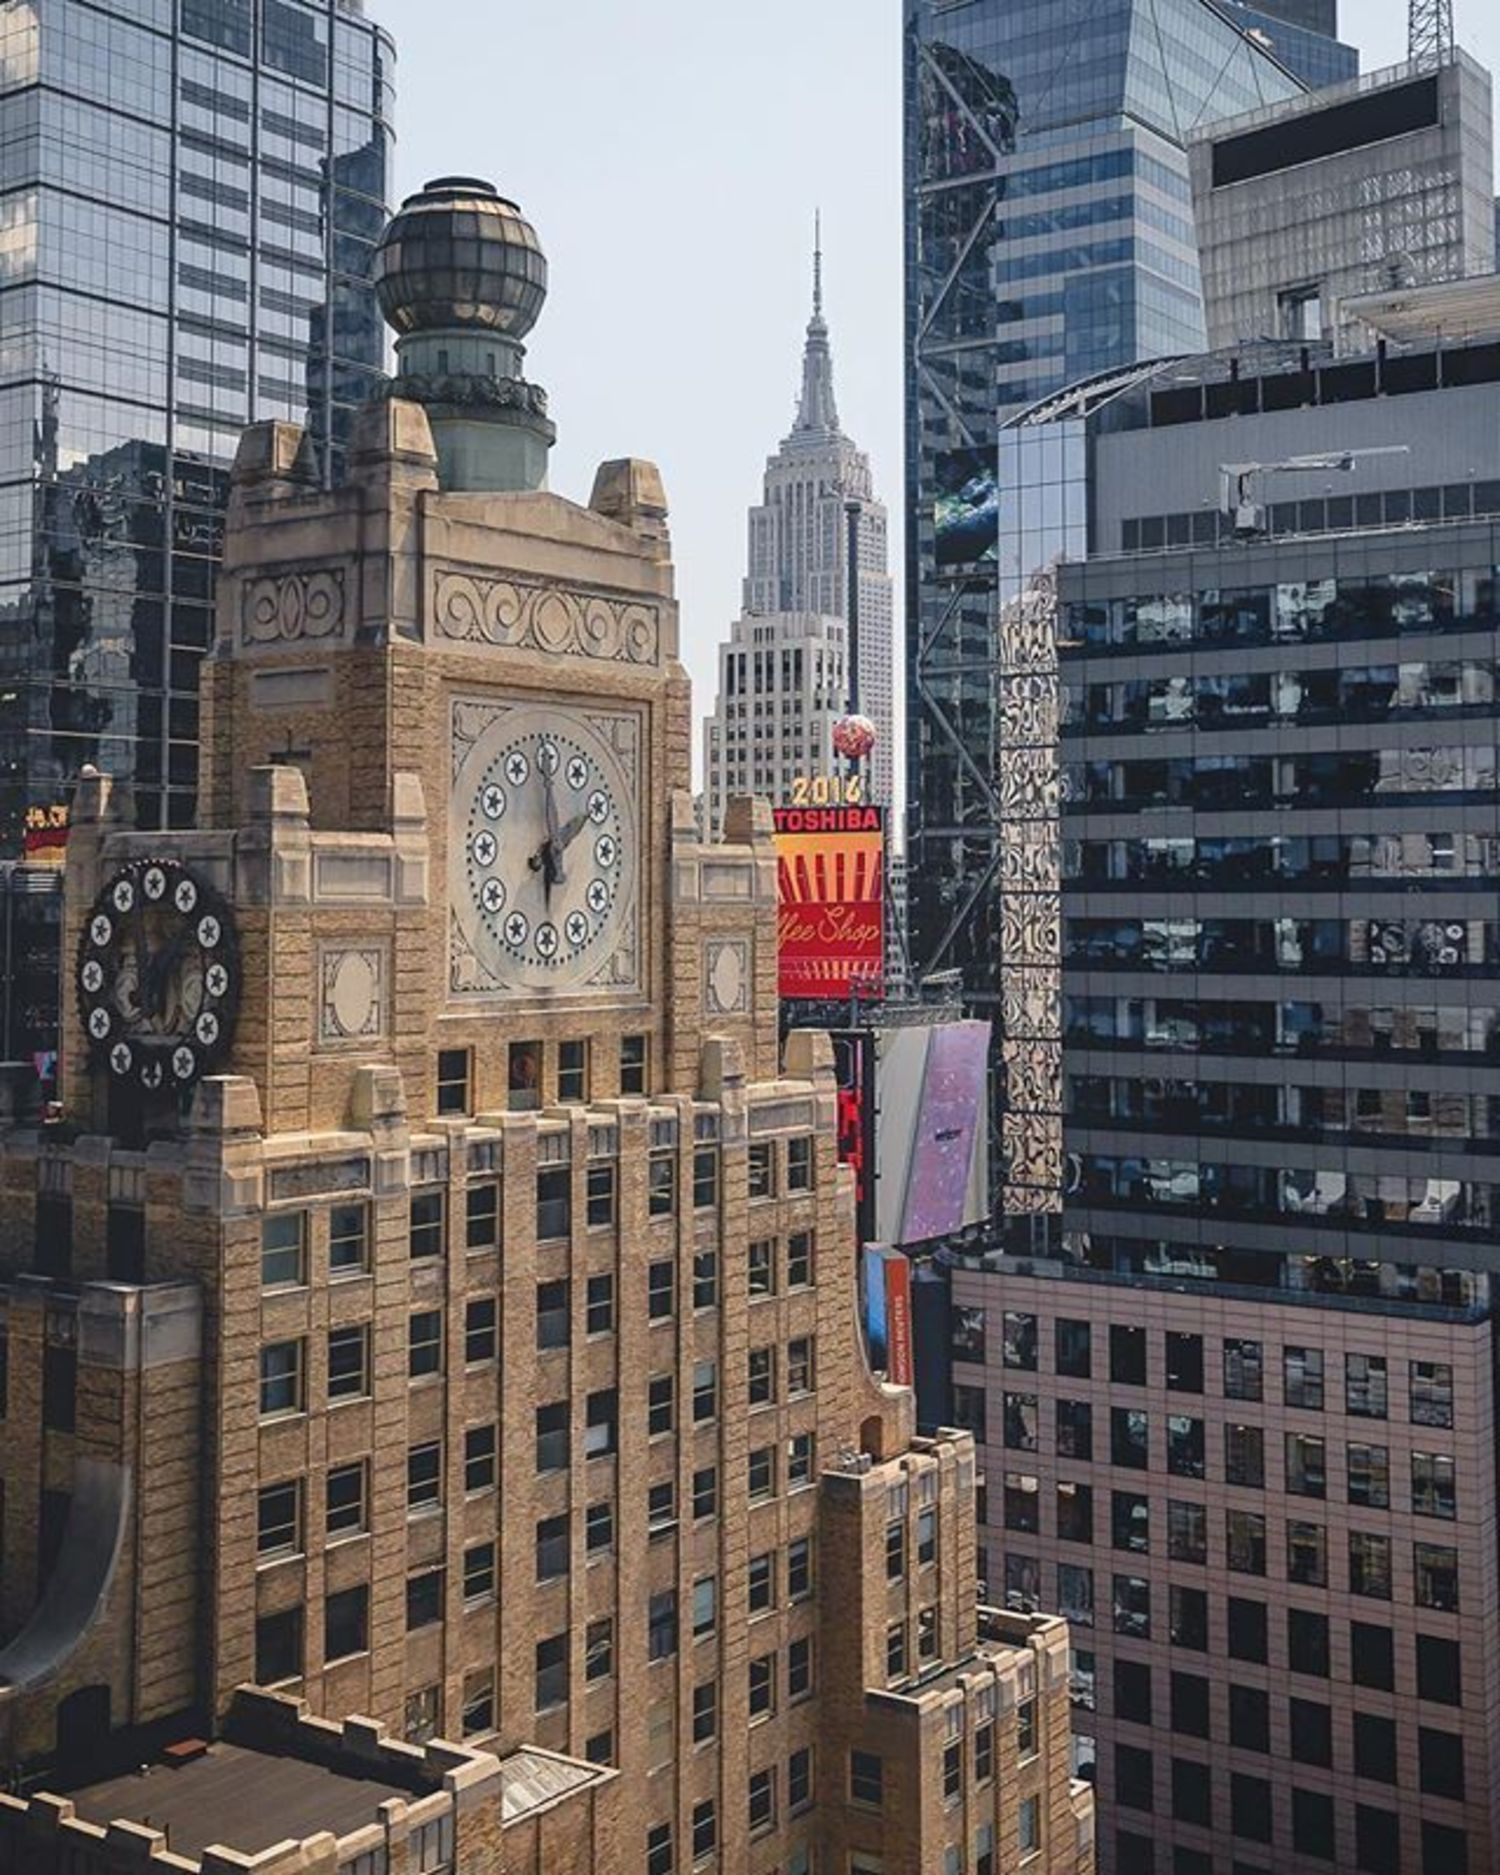 New York, New York. Photo via @ceos_downbeat #viewingnyc #newyork #newyorkcity #nyc